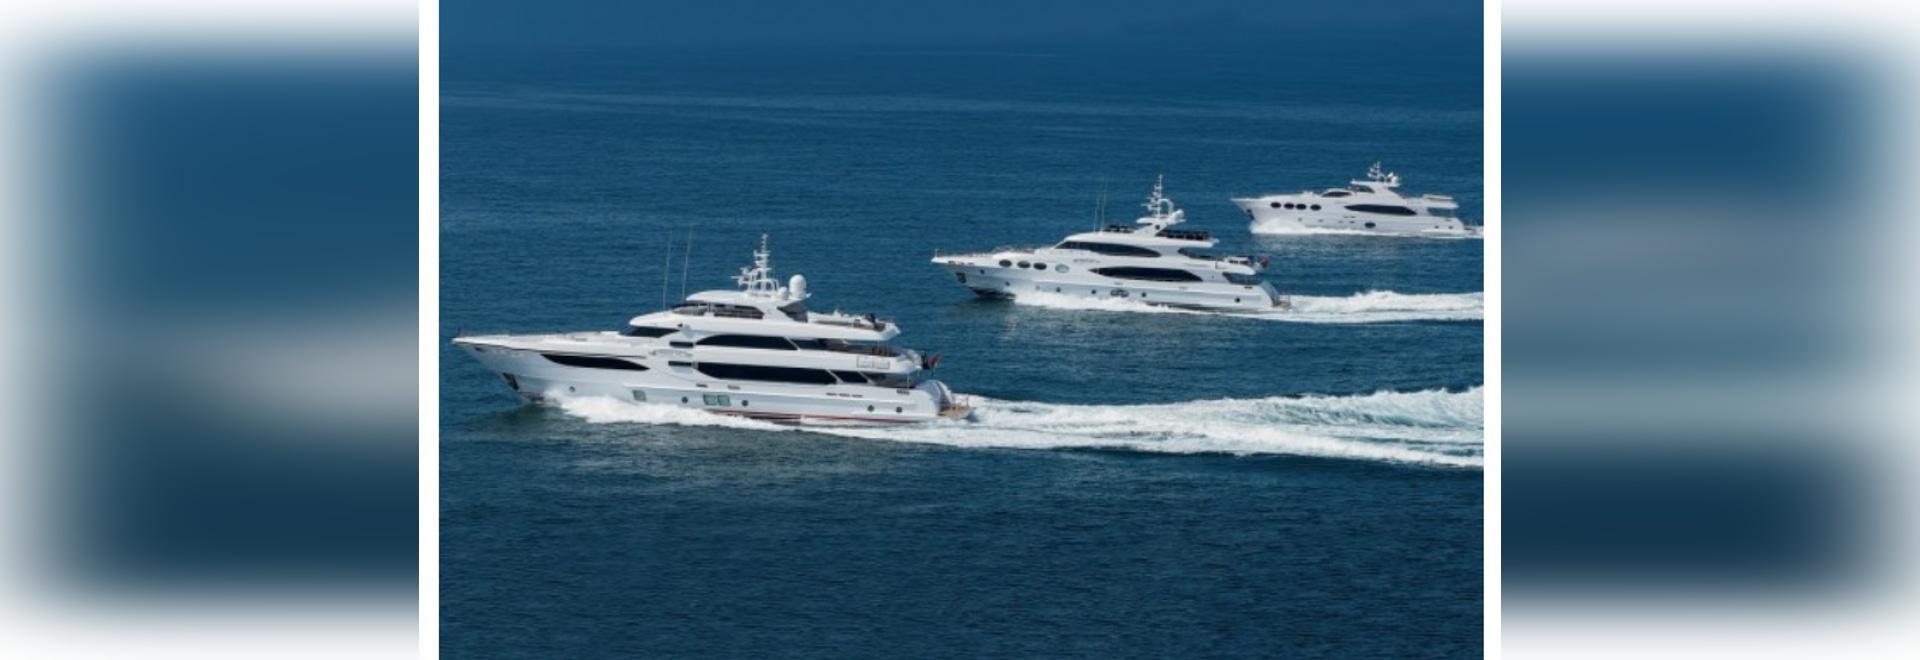 Gulf Craft and Drettmann enter partnership